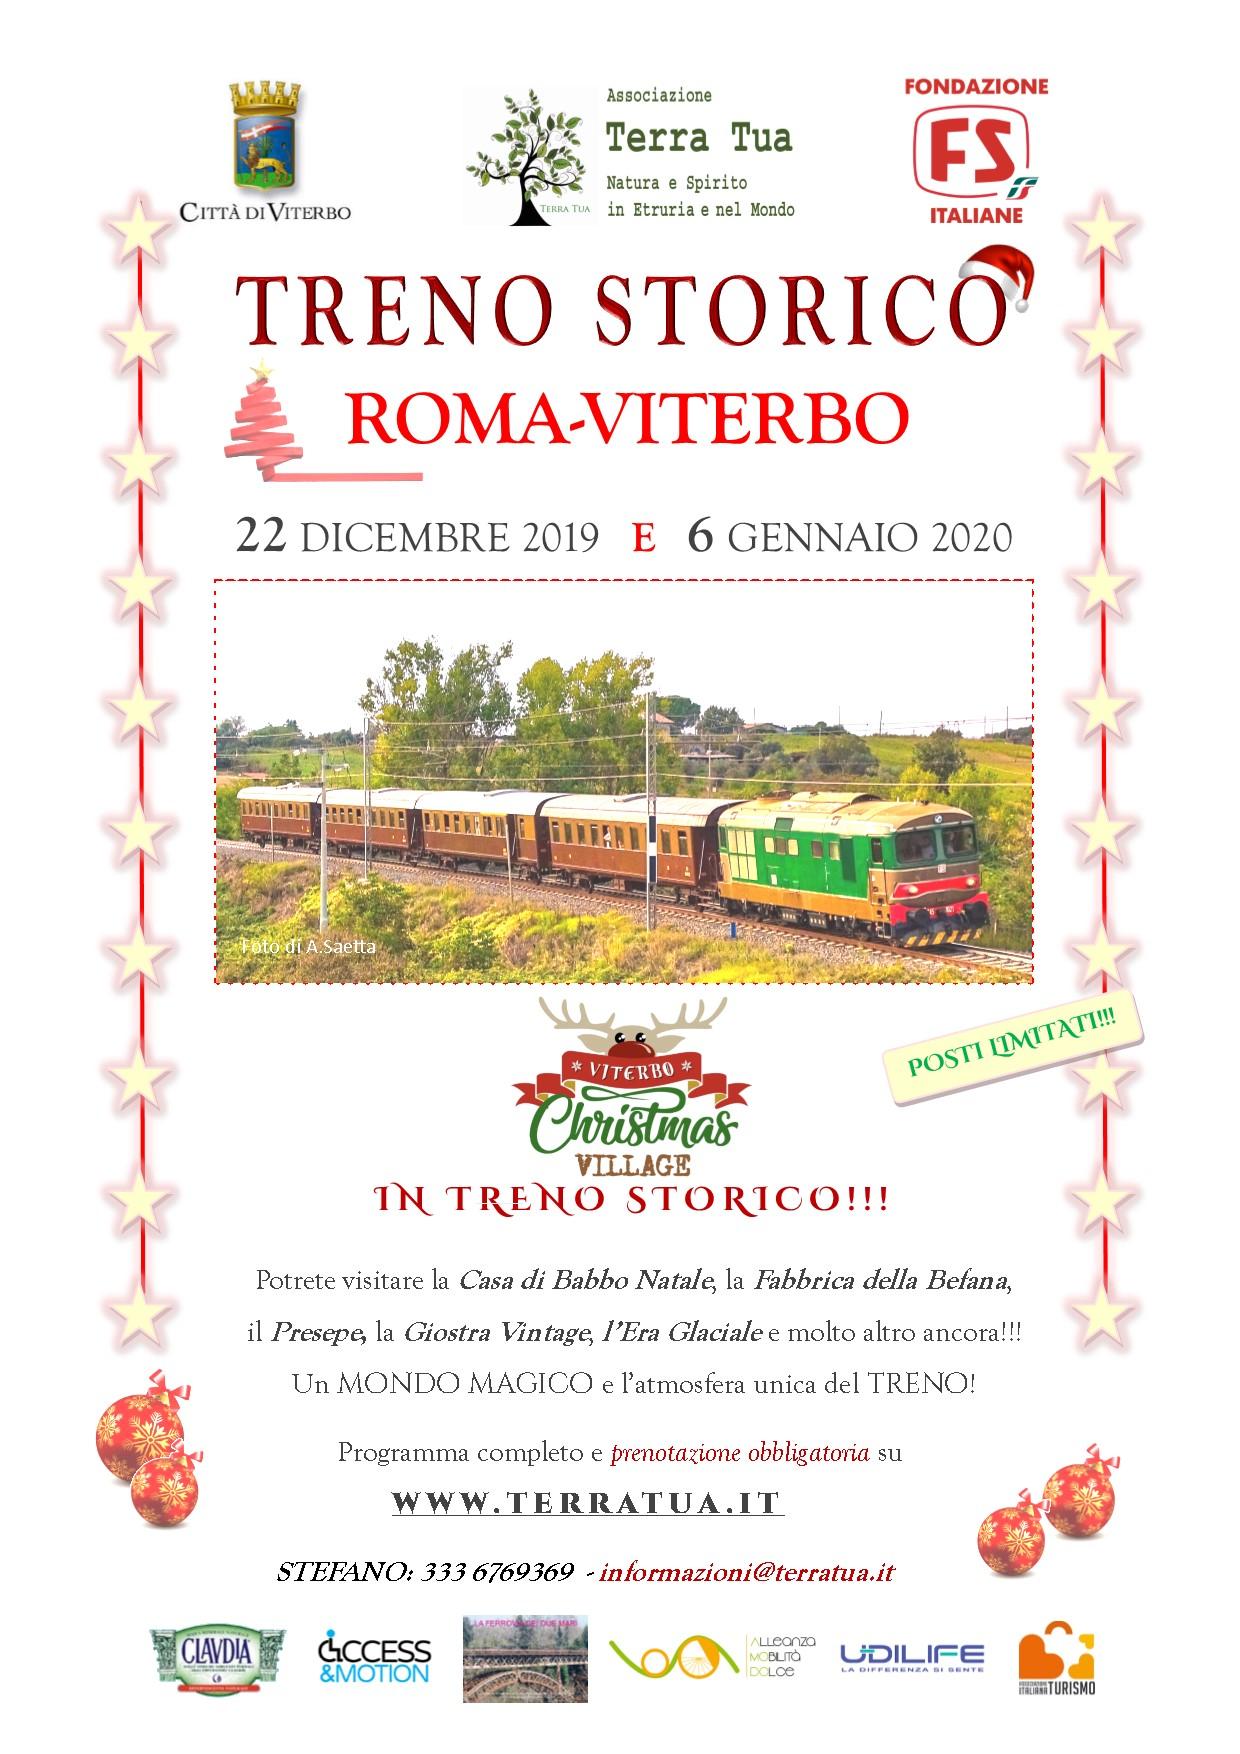 Treno storico Roma-Viterbo